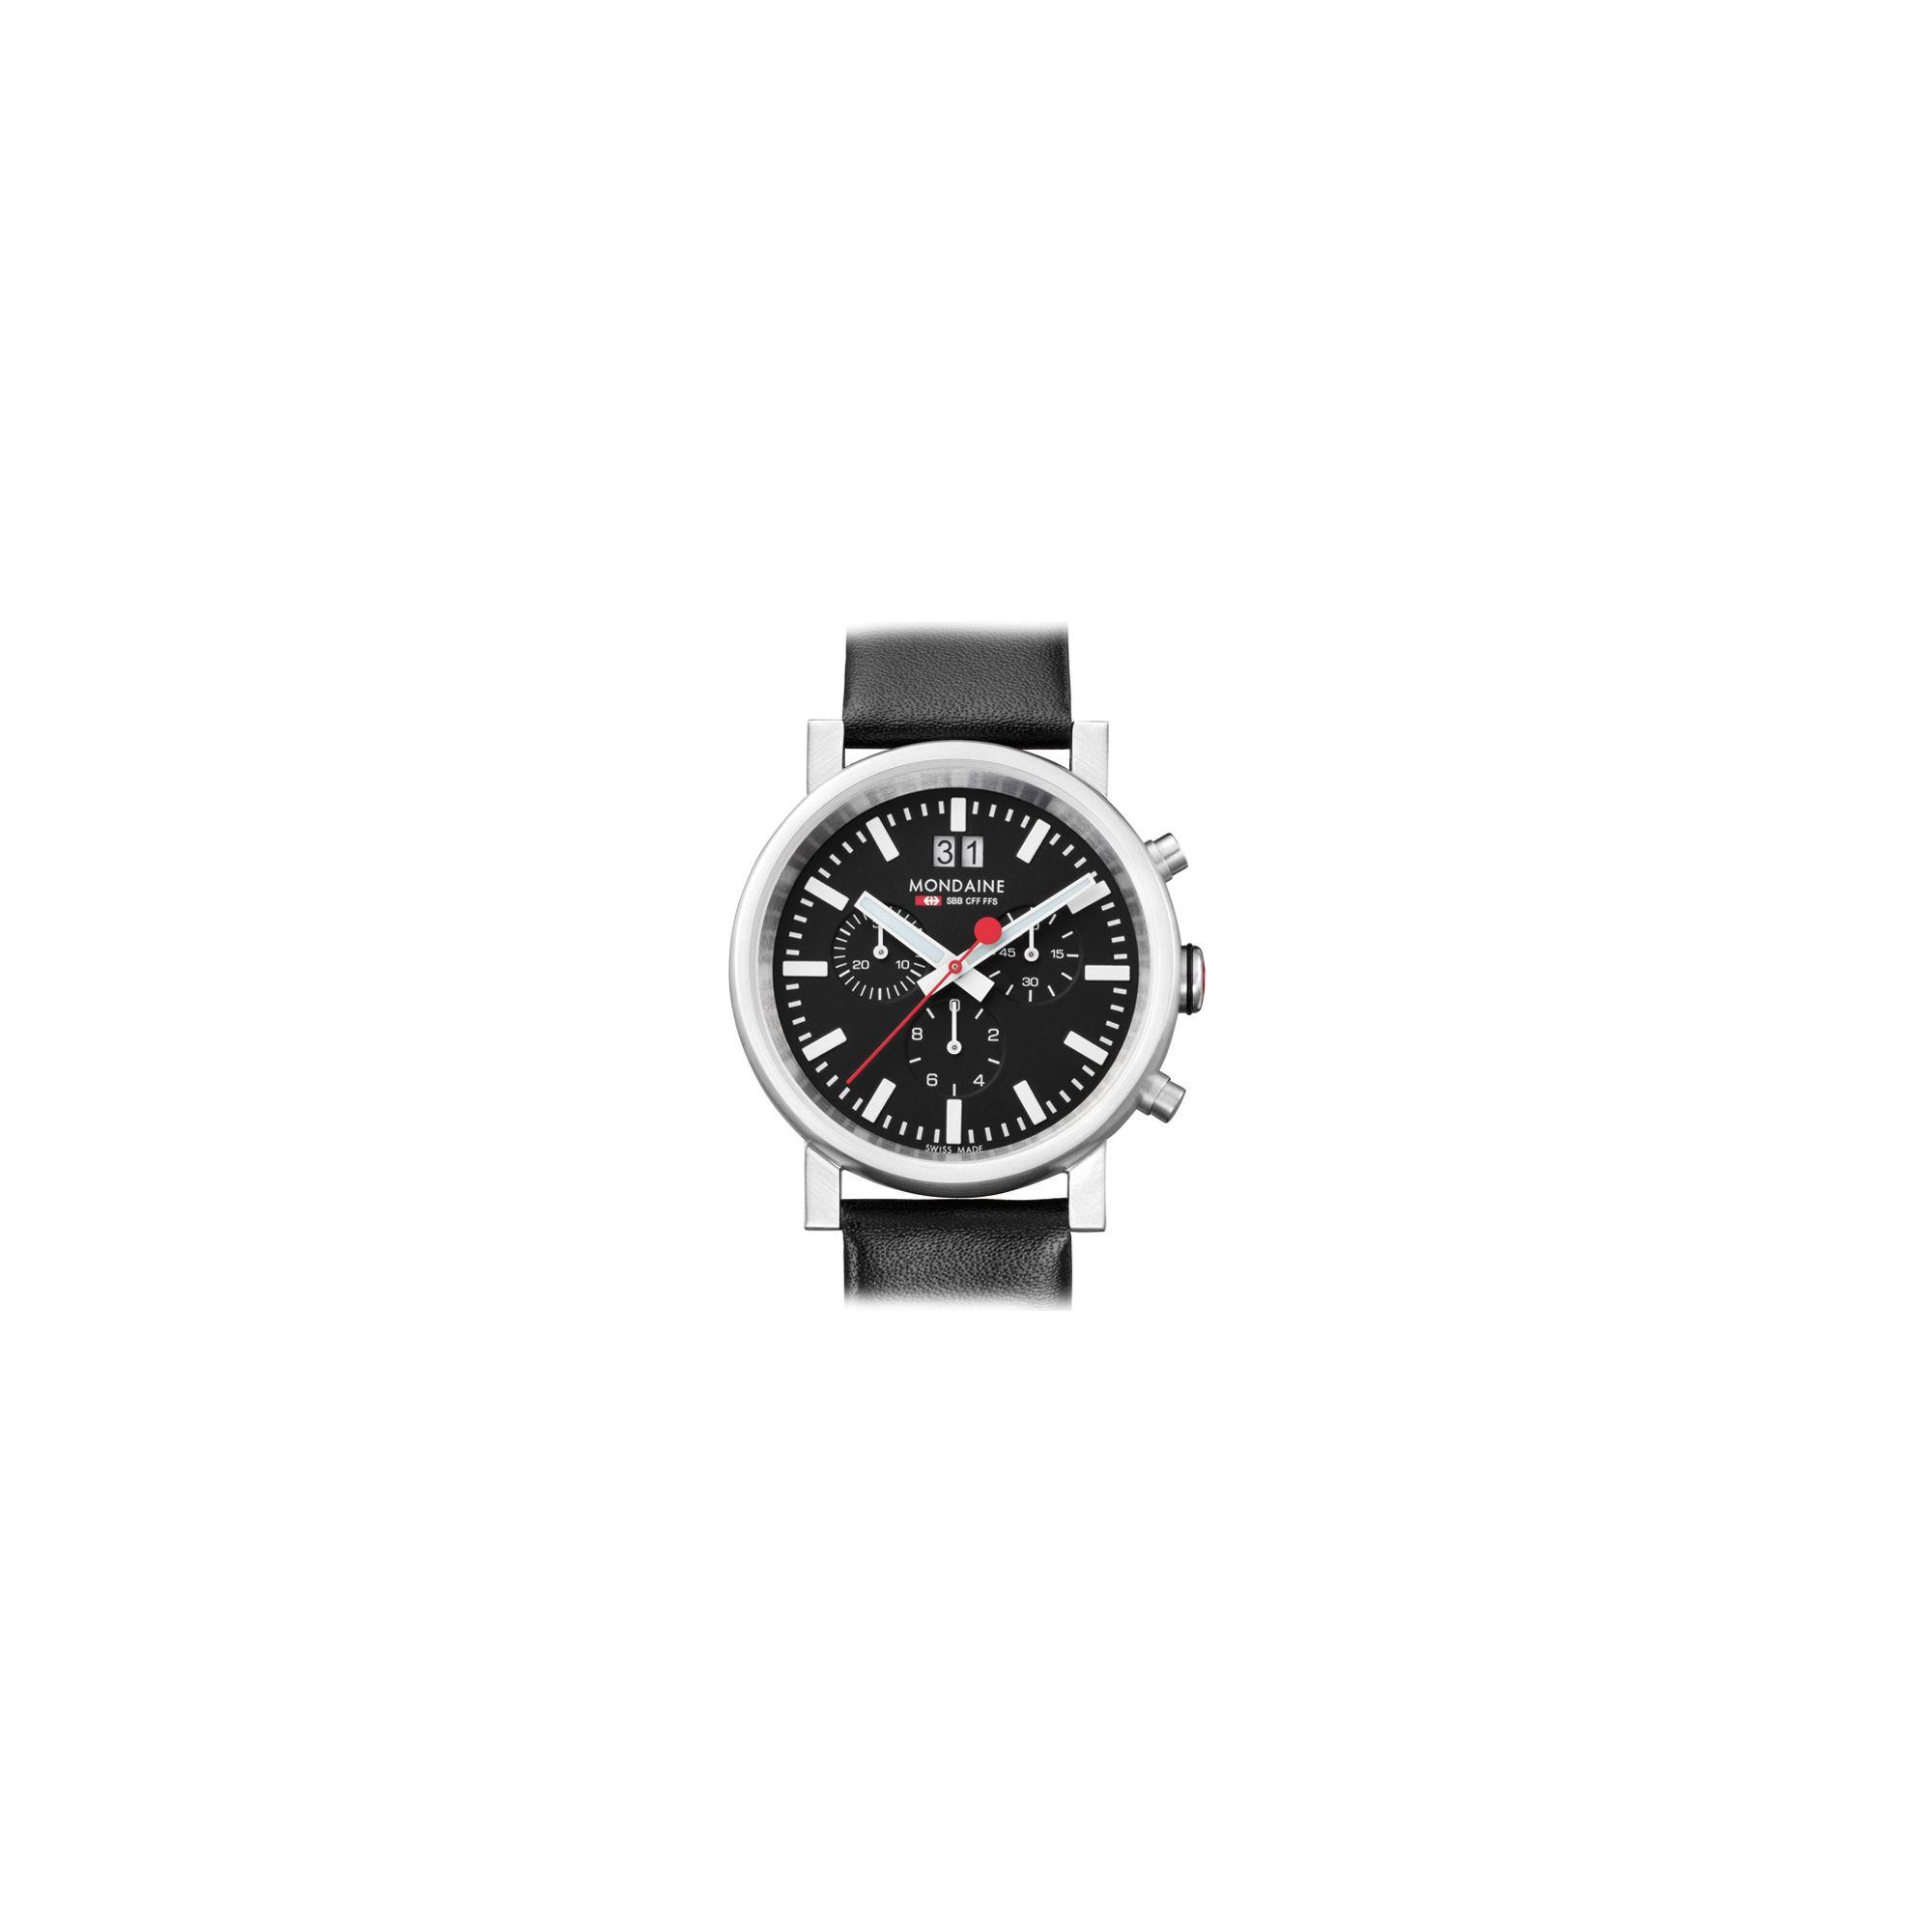 Mondaine Gents Chronograph Strap Watch A6903030414SBB at Tesco Direct